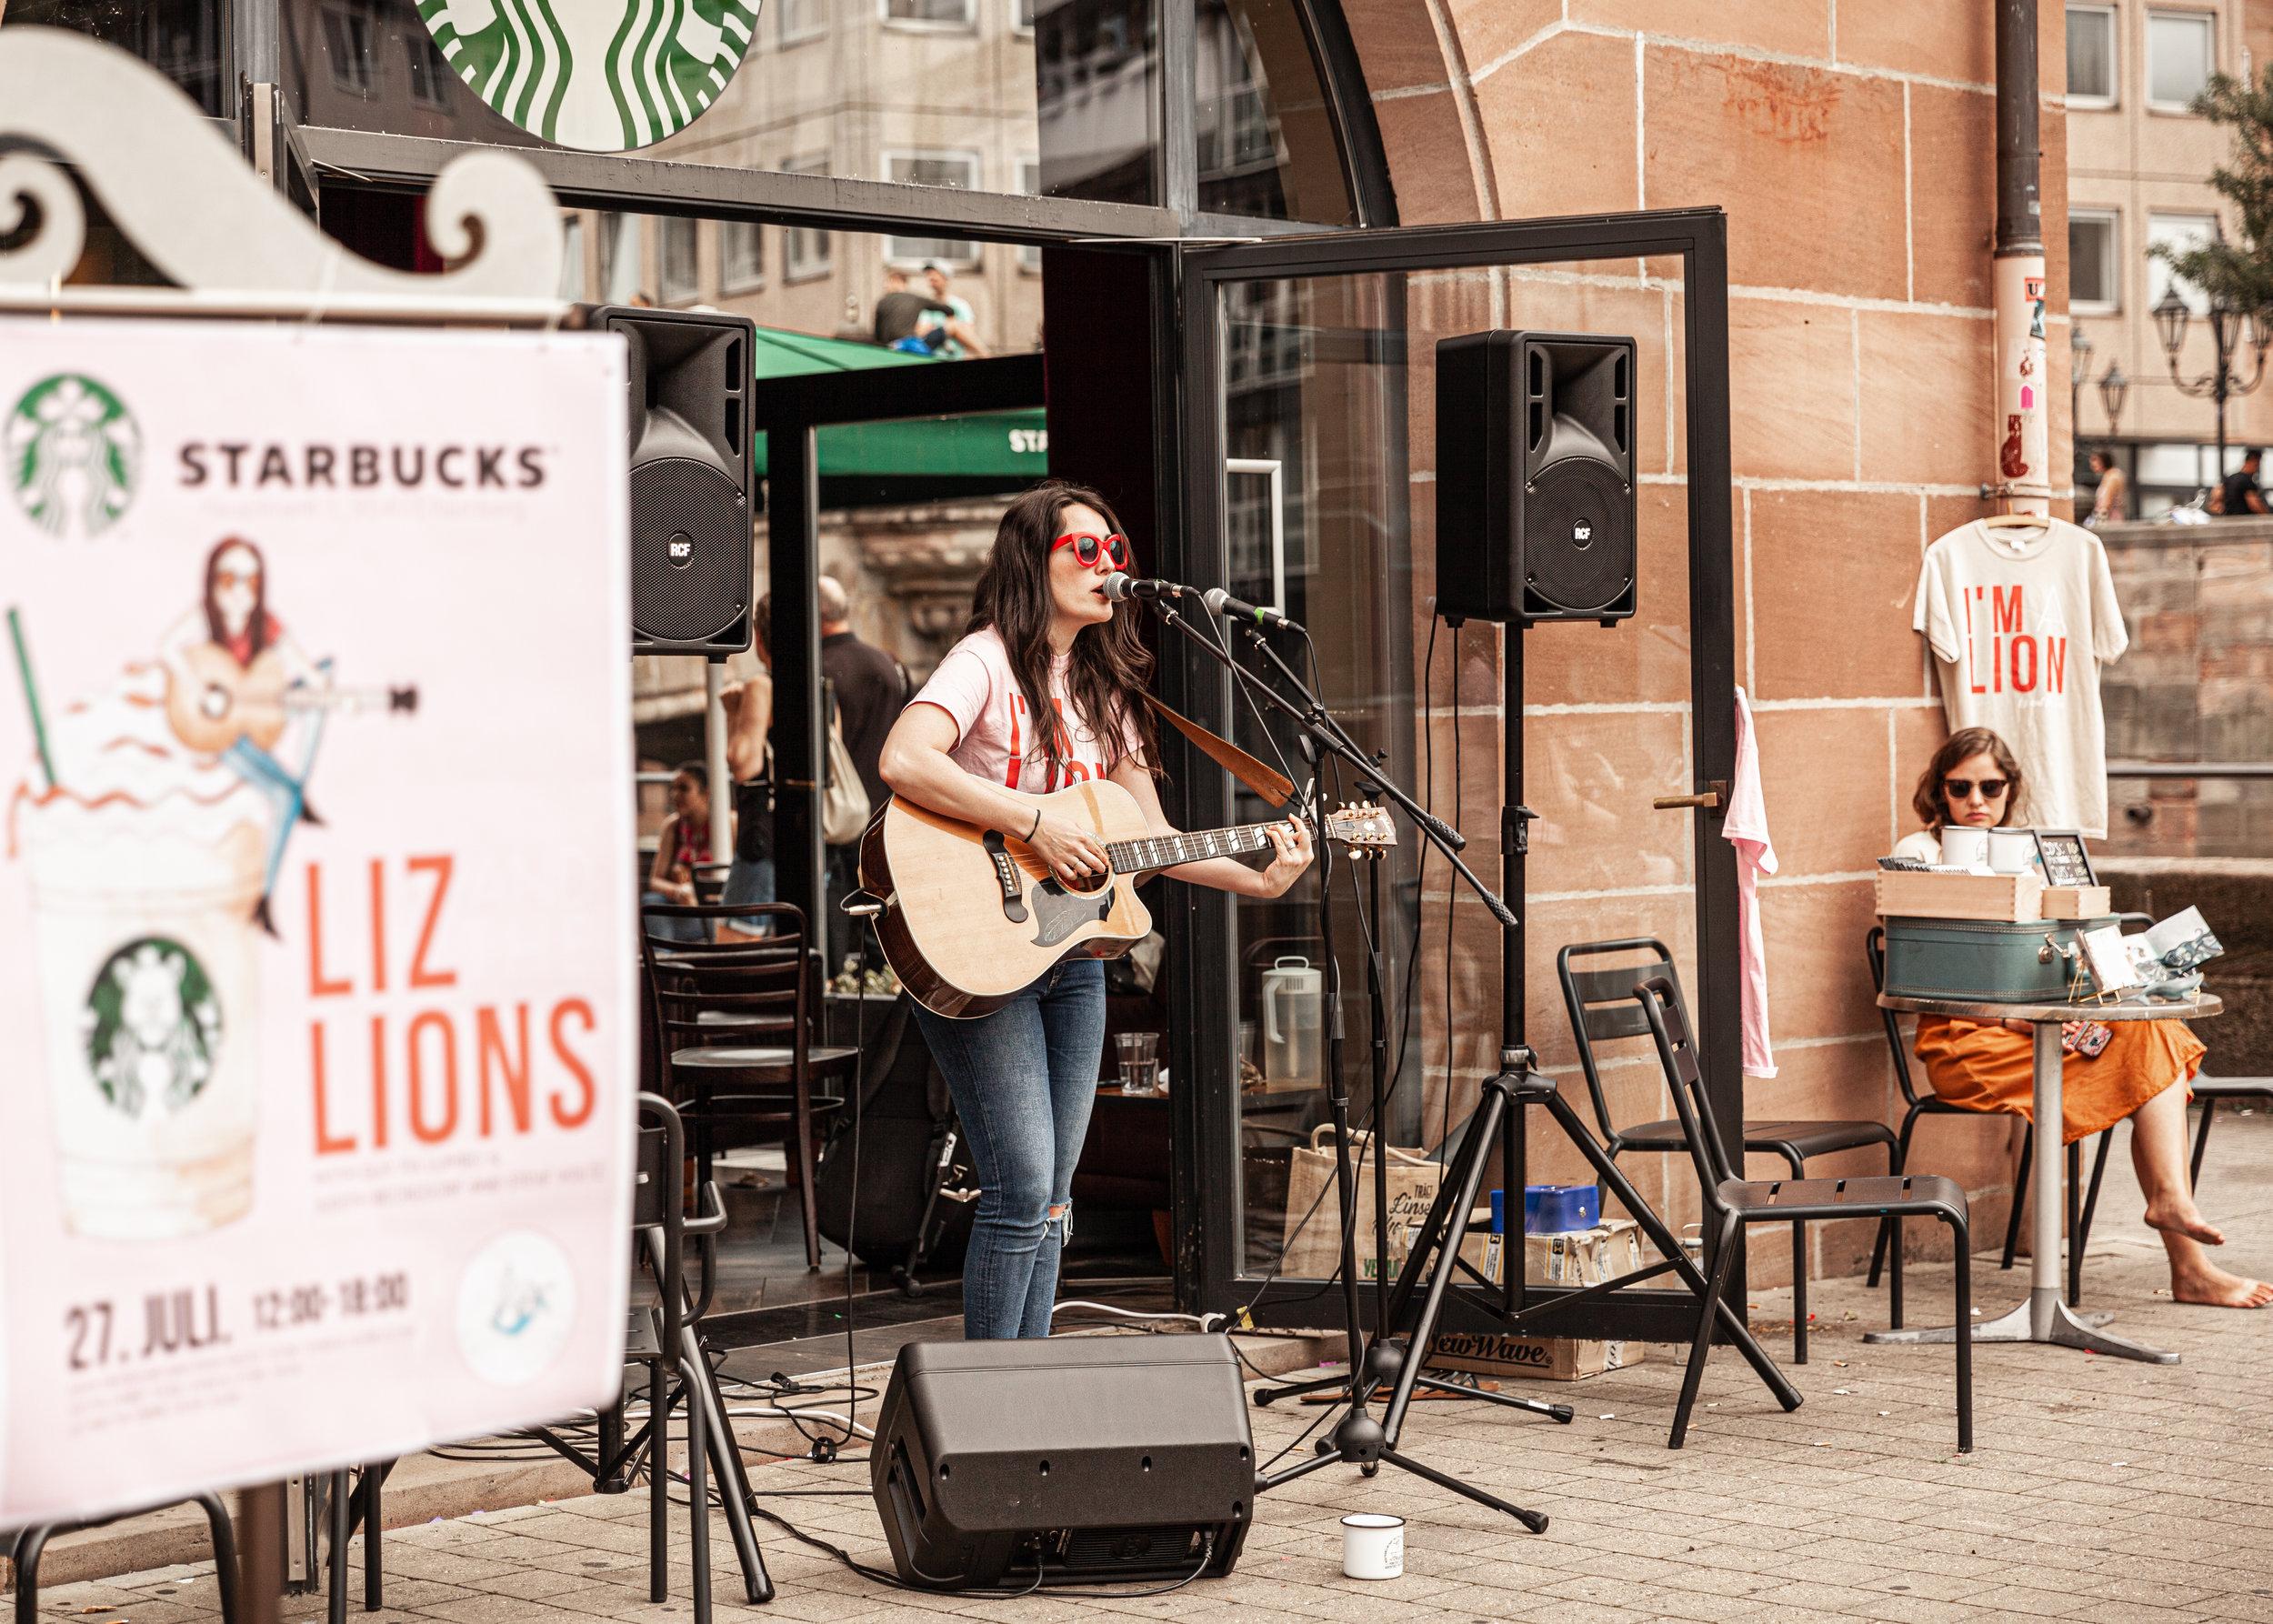 Liz_x_Starbucks_Bardentreffen_2019_High_Res-1.jpg